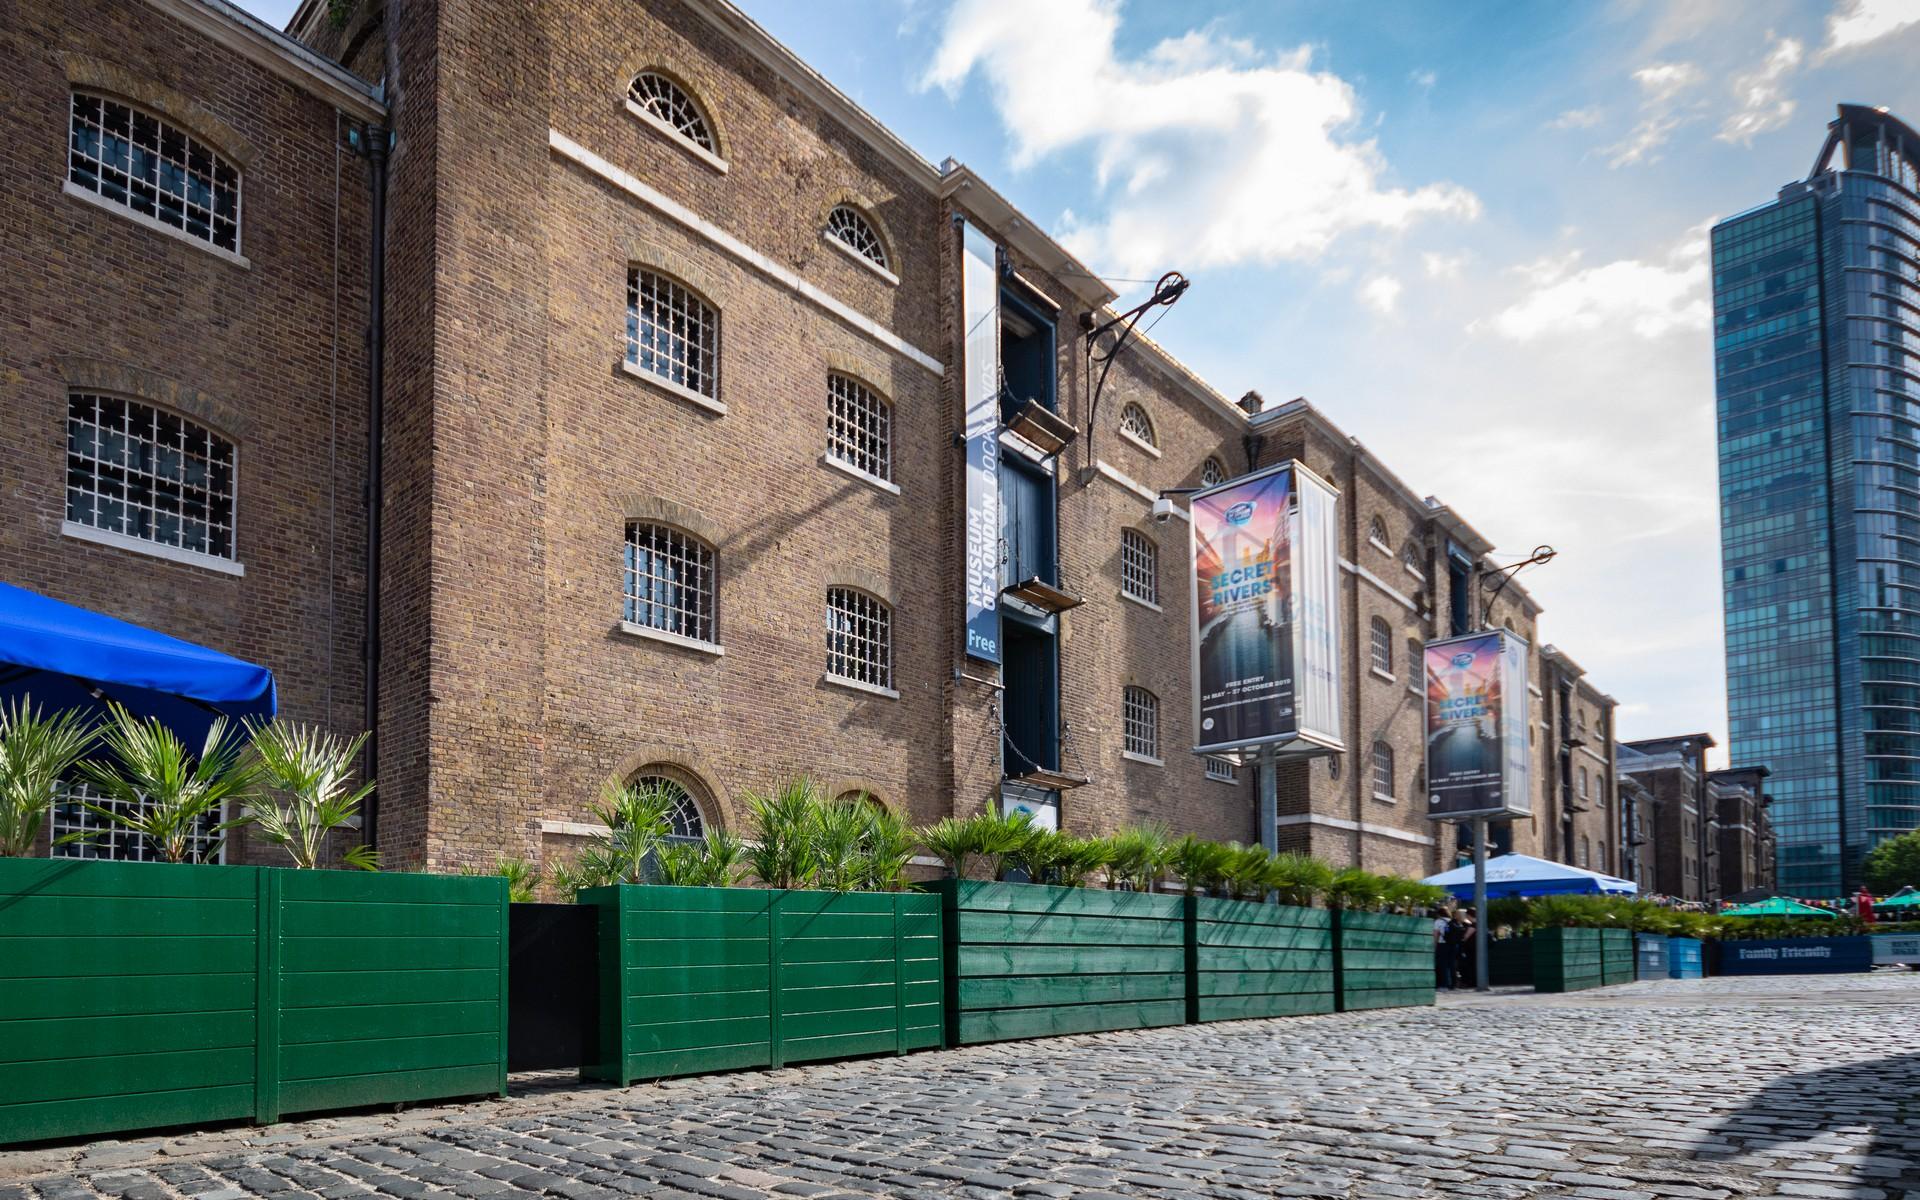 The Museum of London Docklands, Canary Wharf E14